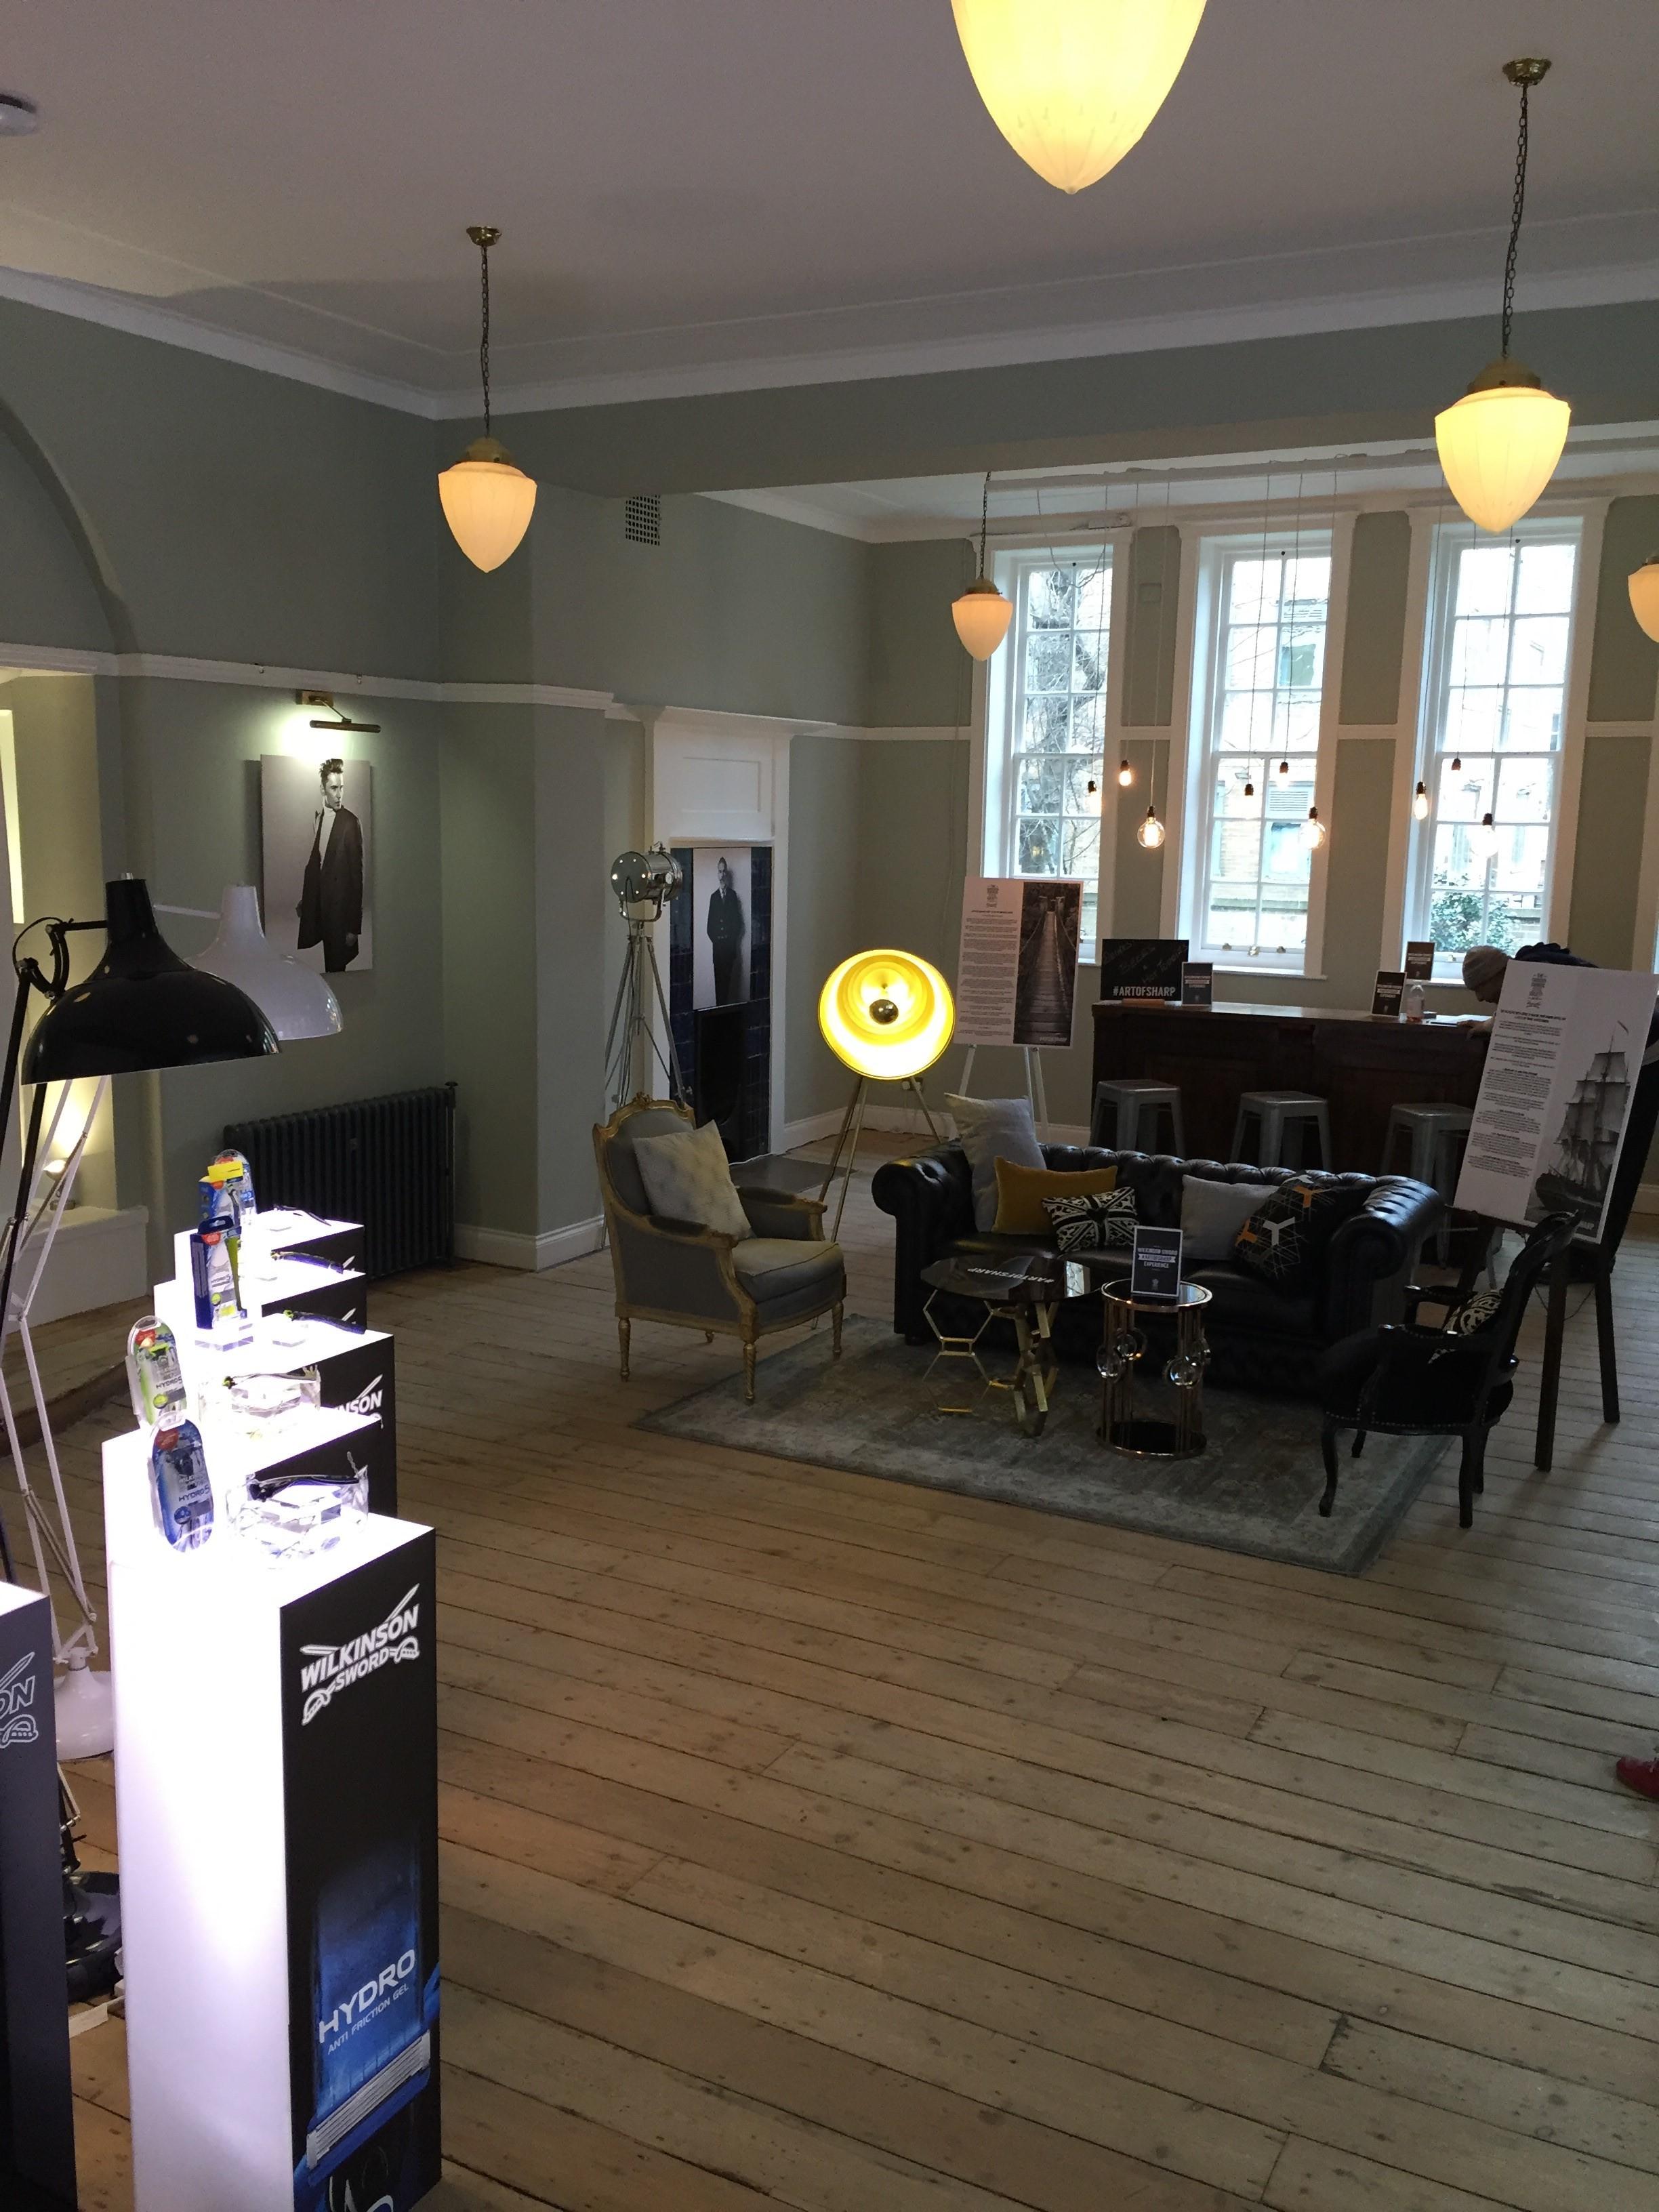 Voysey Conference and Exhibition Venue